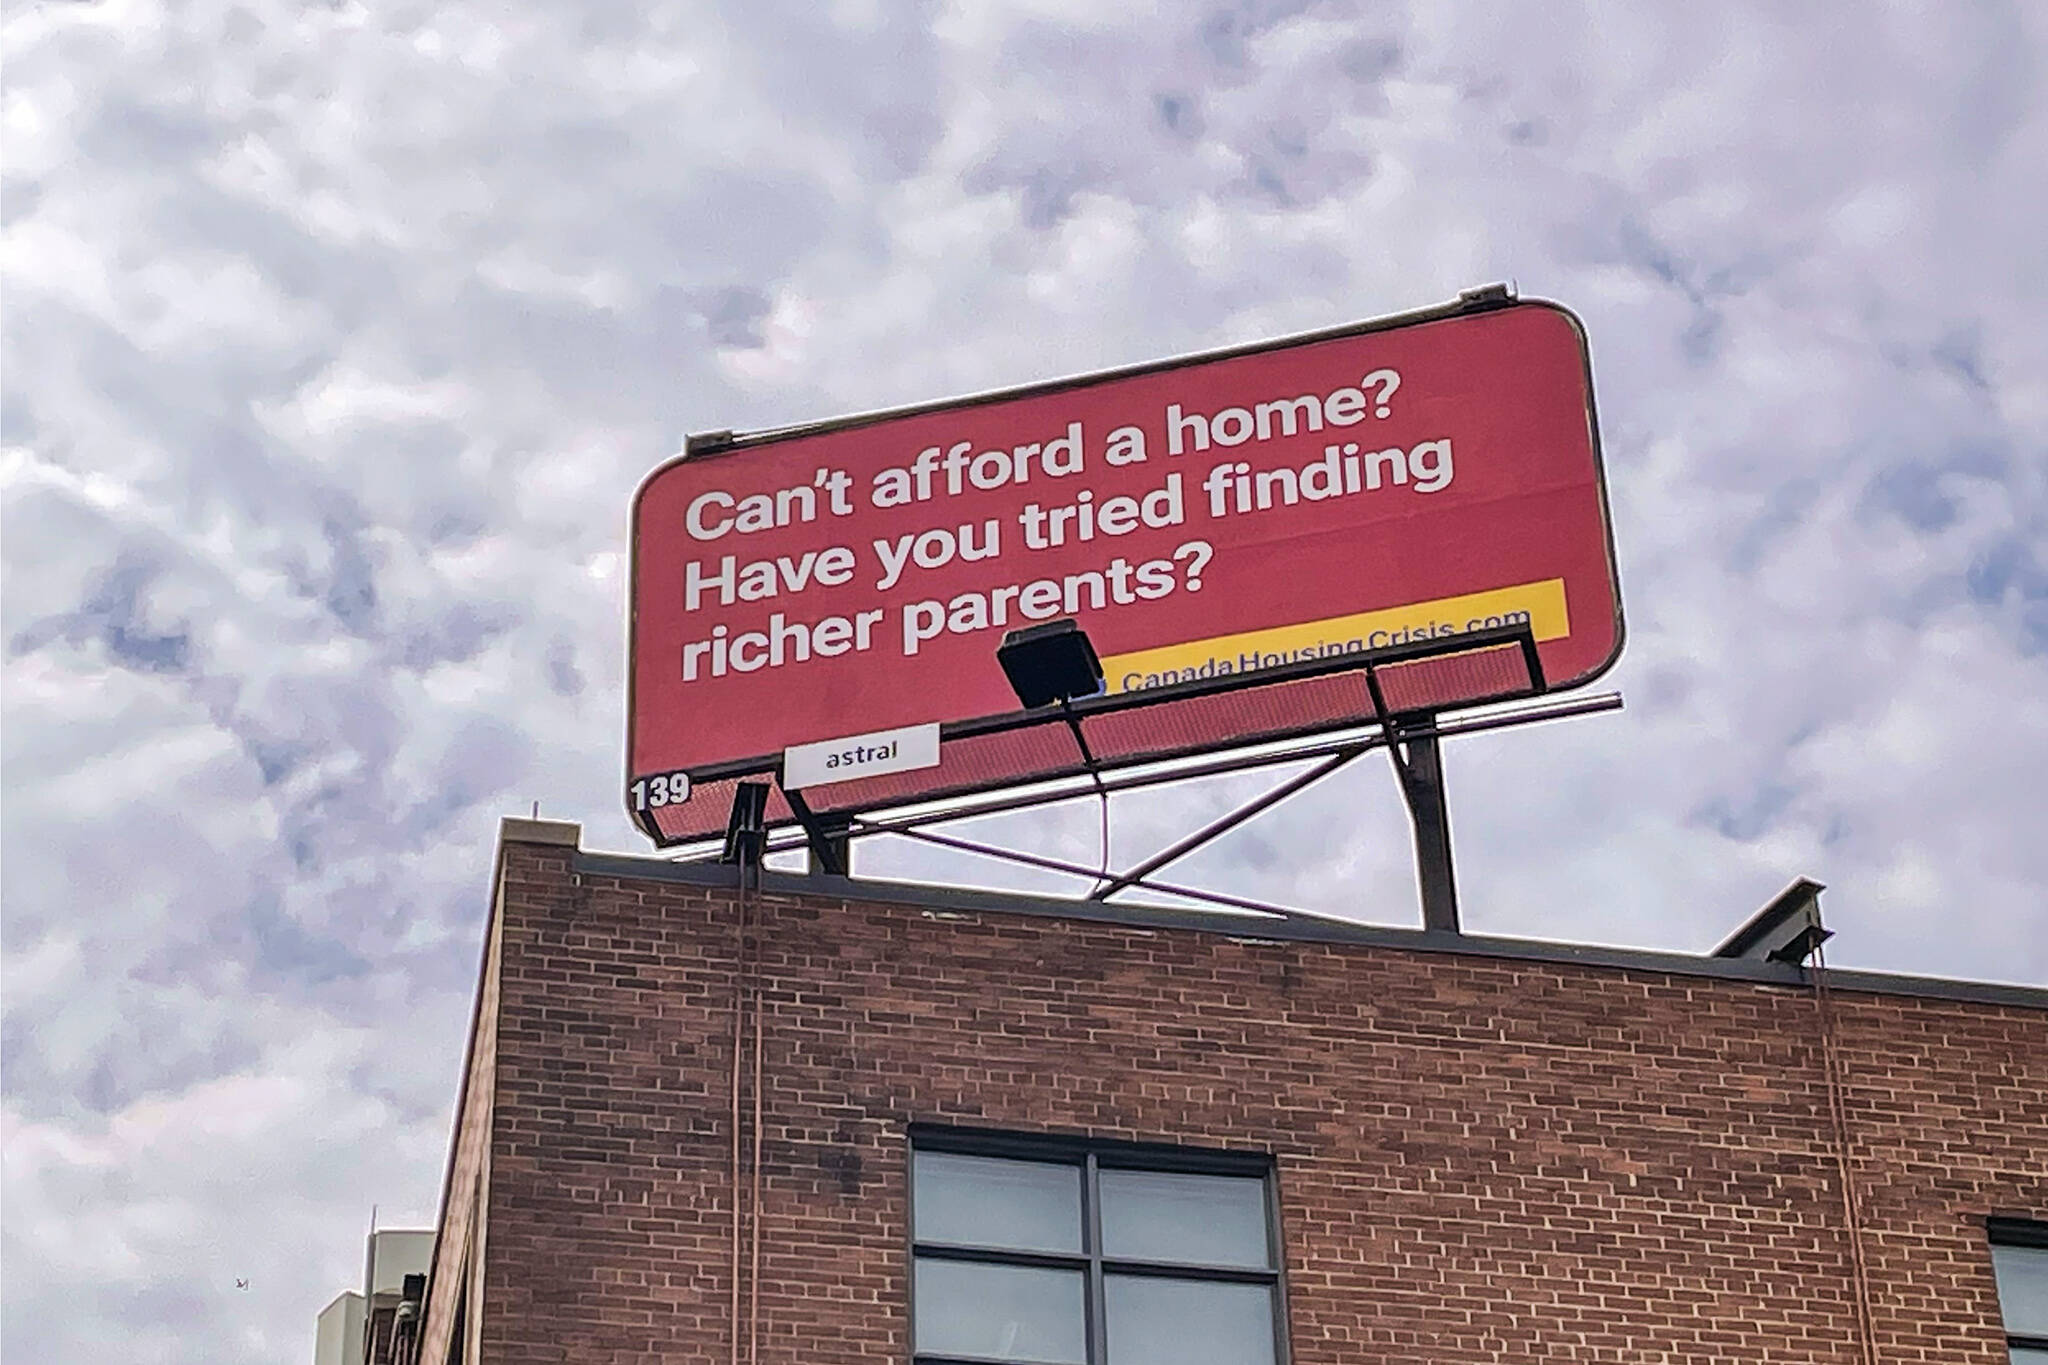 canada housing crisis